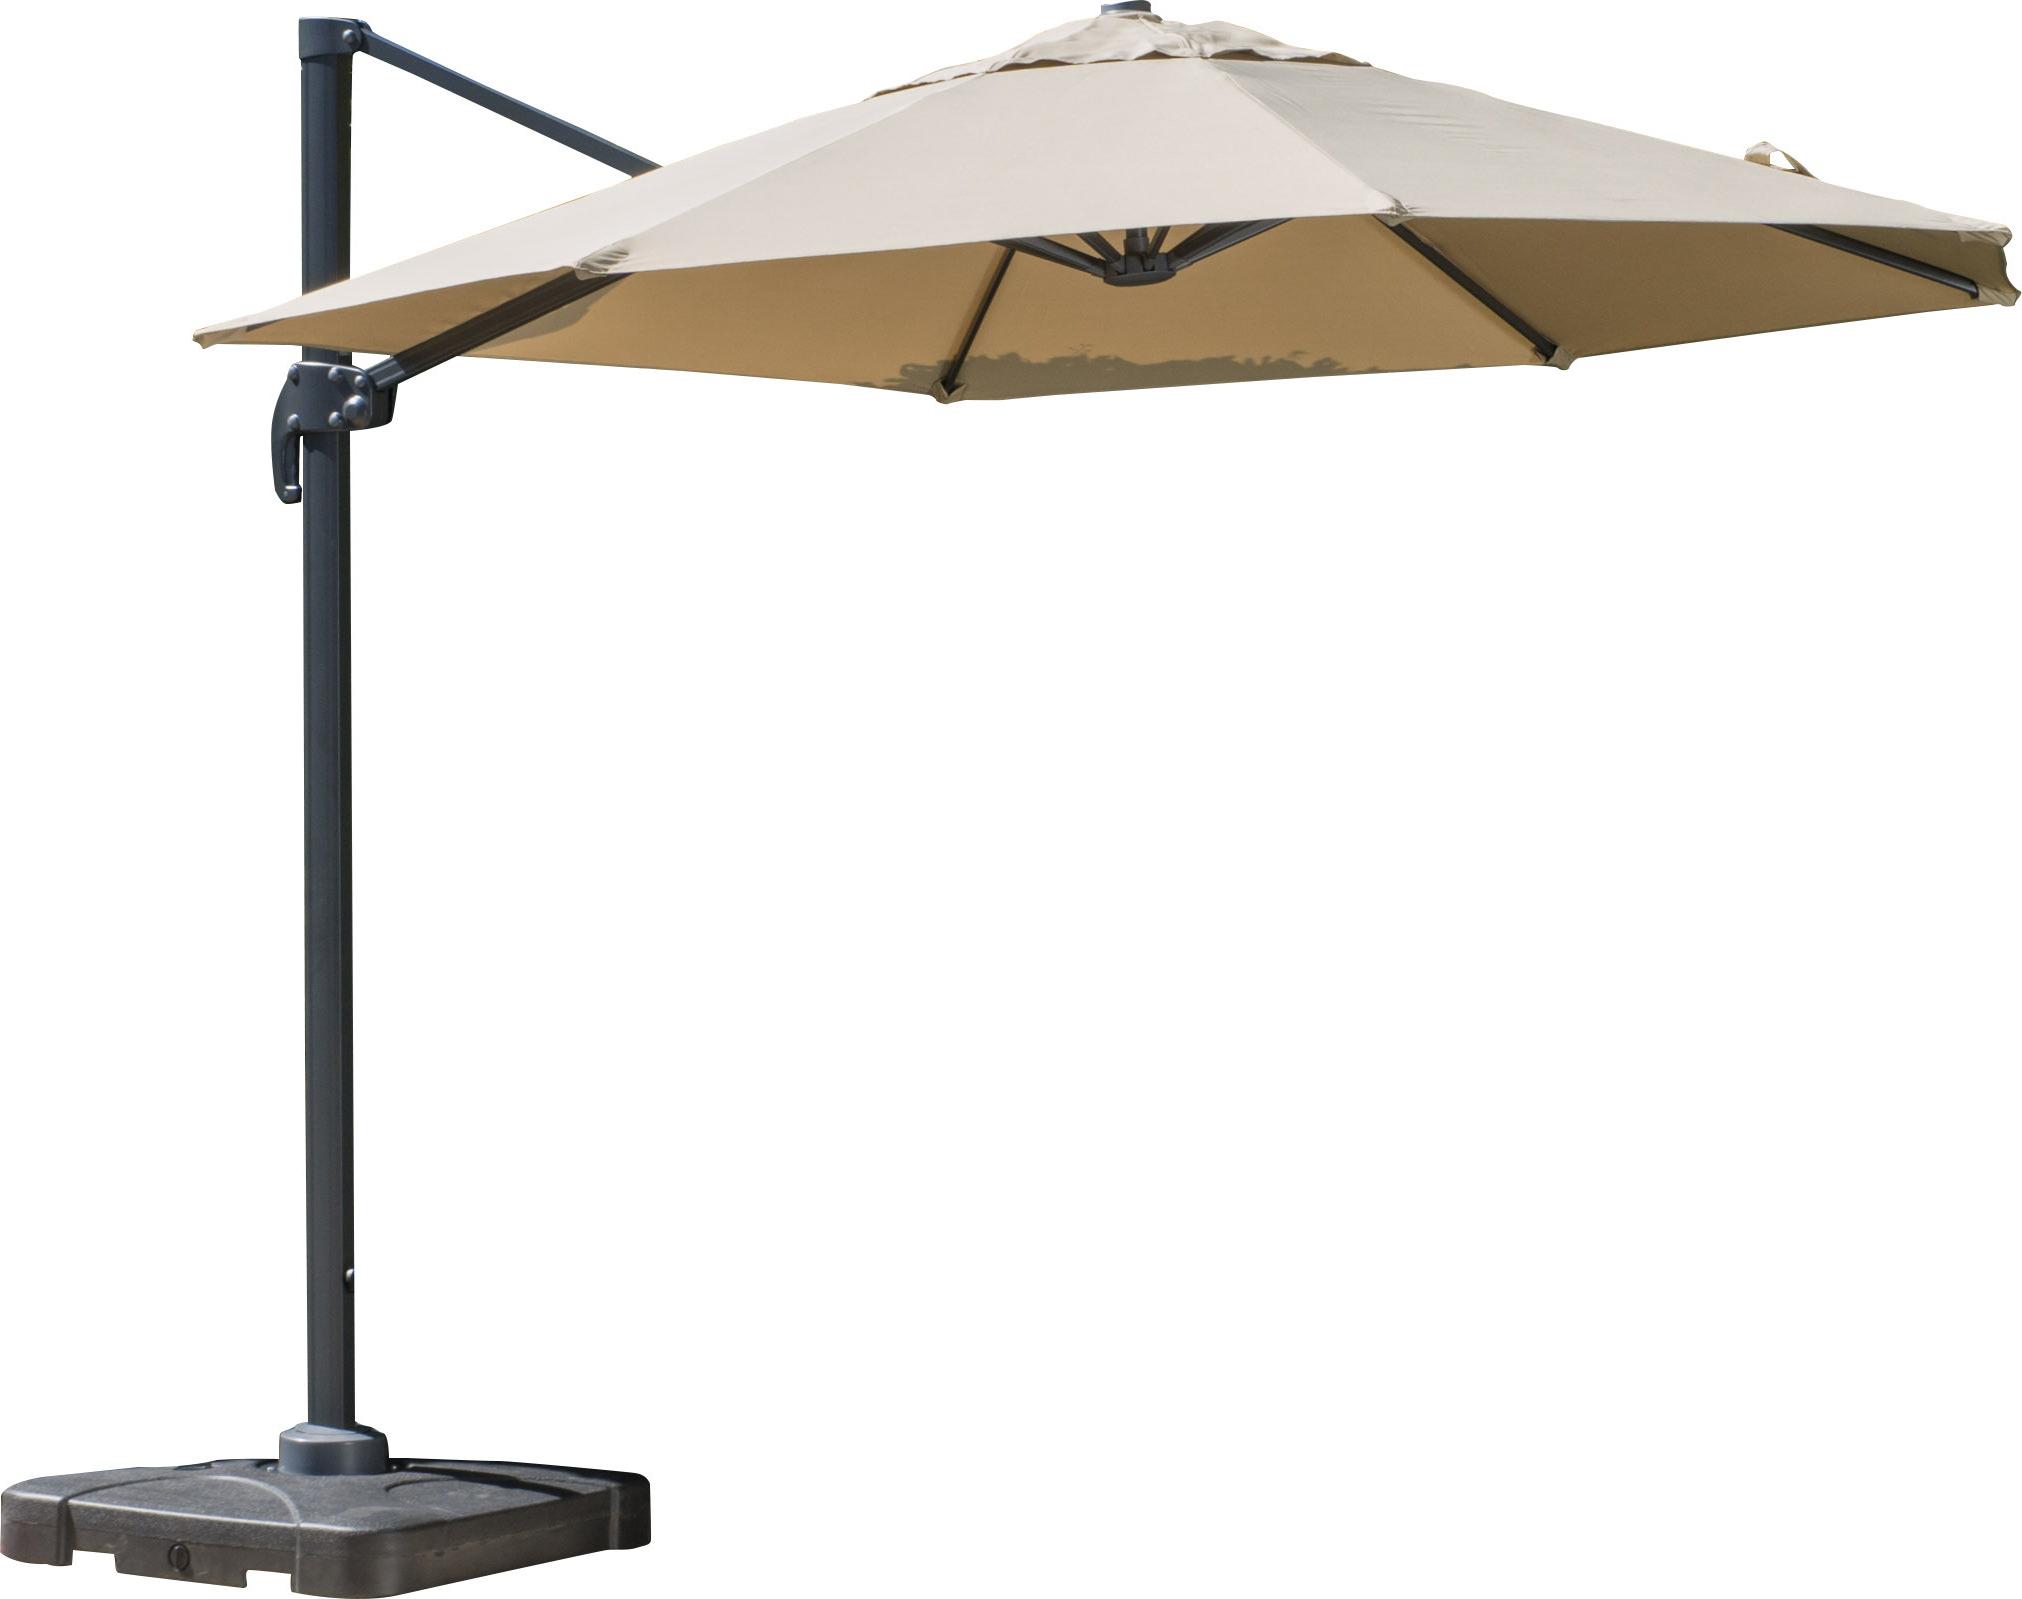 2020 Carlisle Cantilever Sunbrella Umbrellas Pertaining To Bellana Cantilever Umbrella (Gallery 11 of 20)